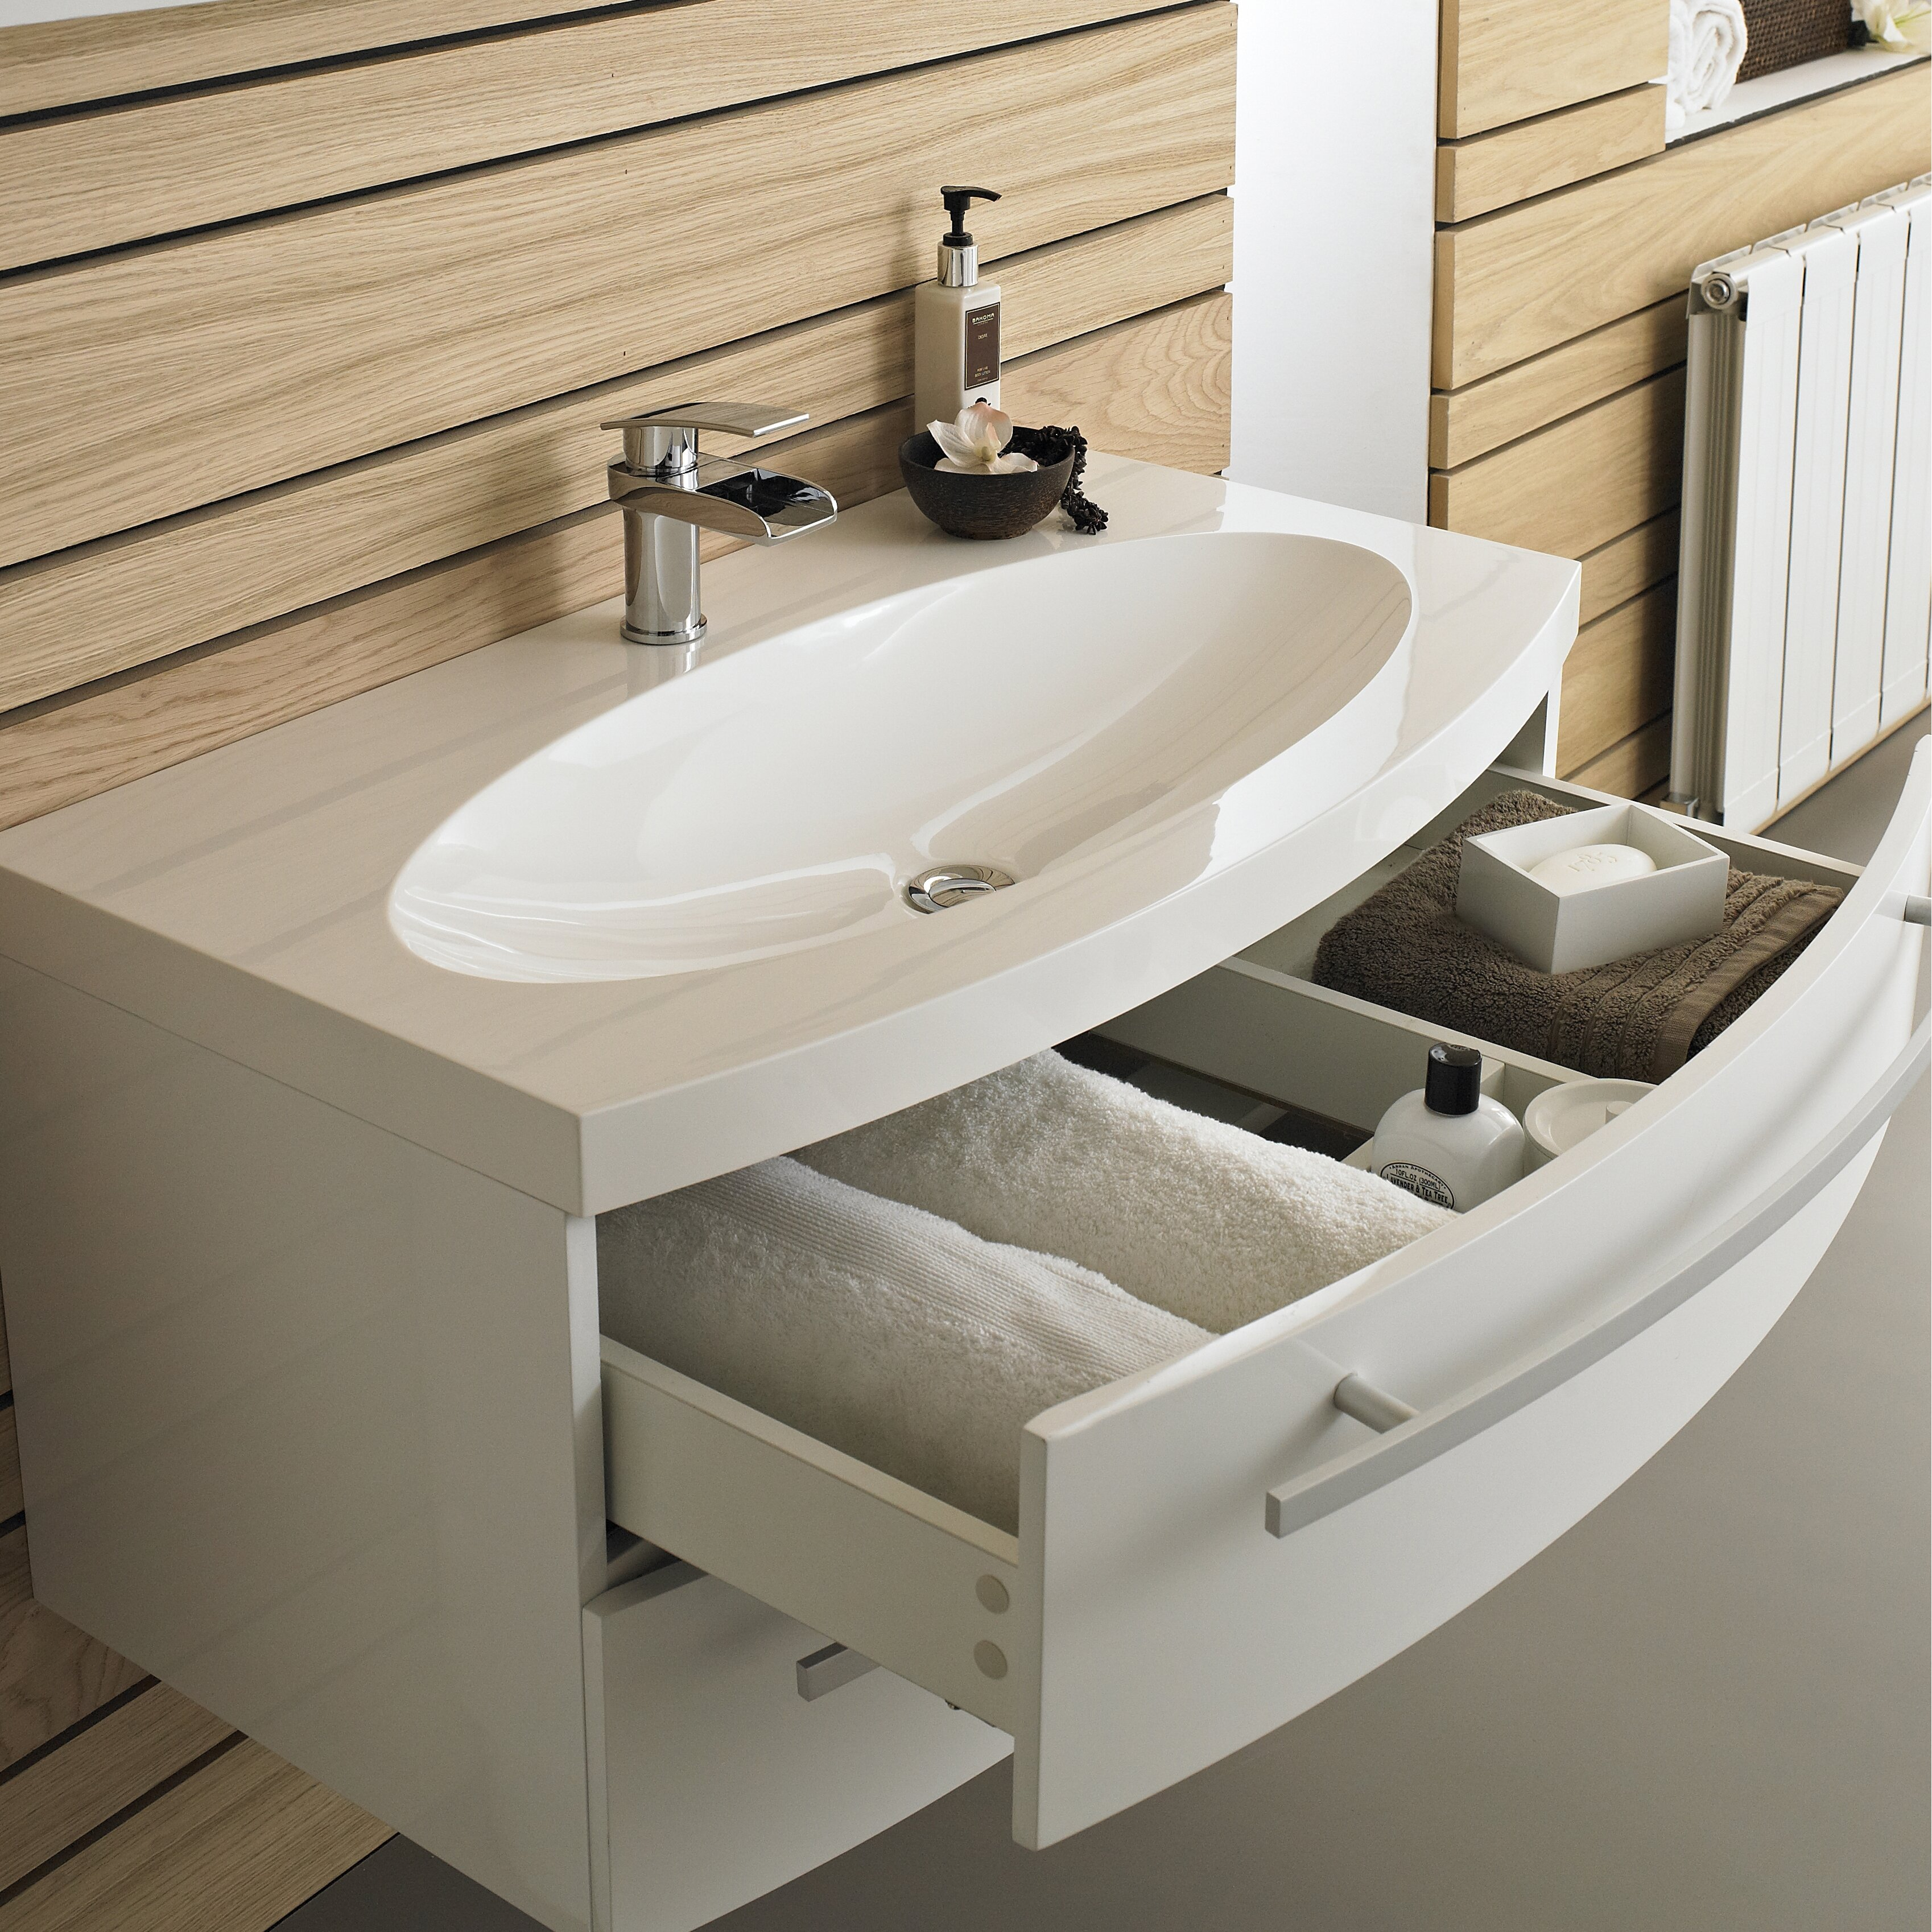 hudson reed vanguard cm wall mounted vanity unit reviews hudson reed vanguard 91 4cm wall mounted vanity unit